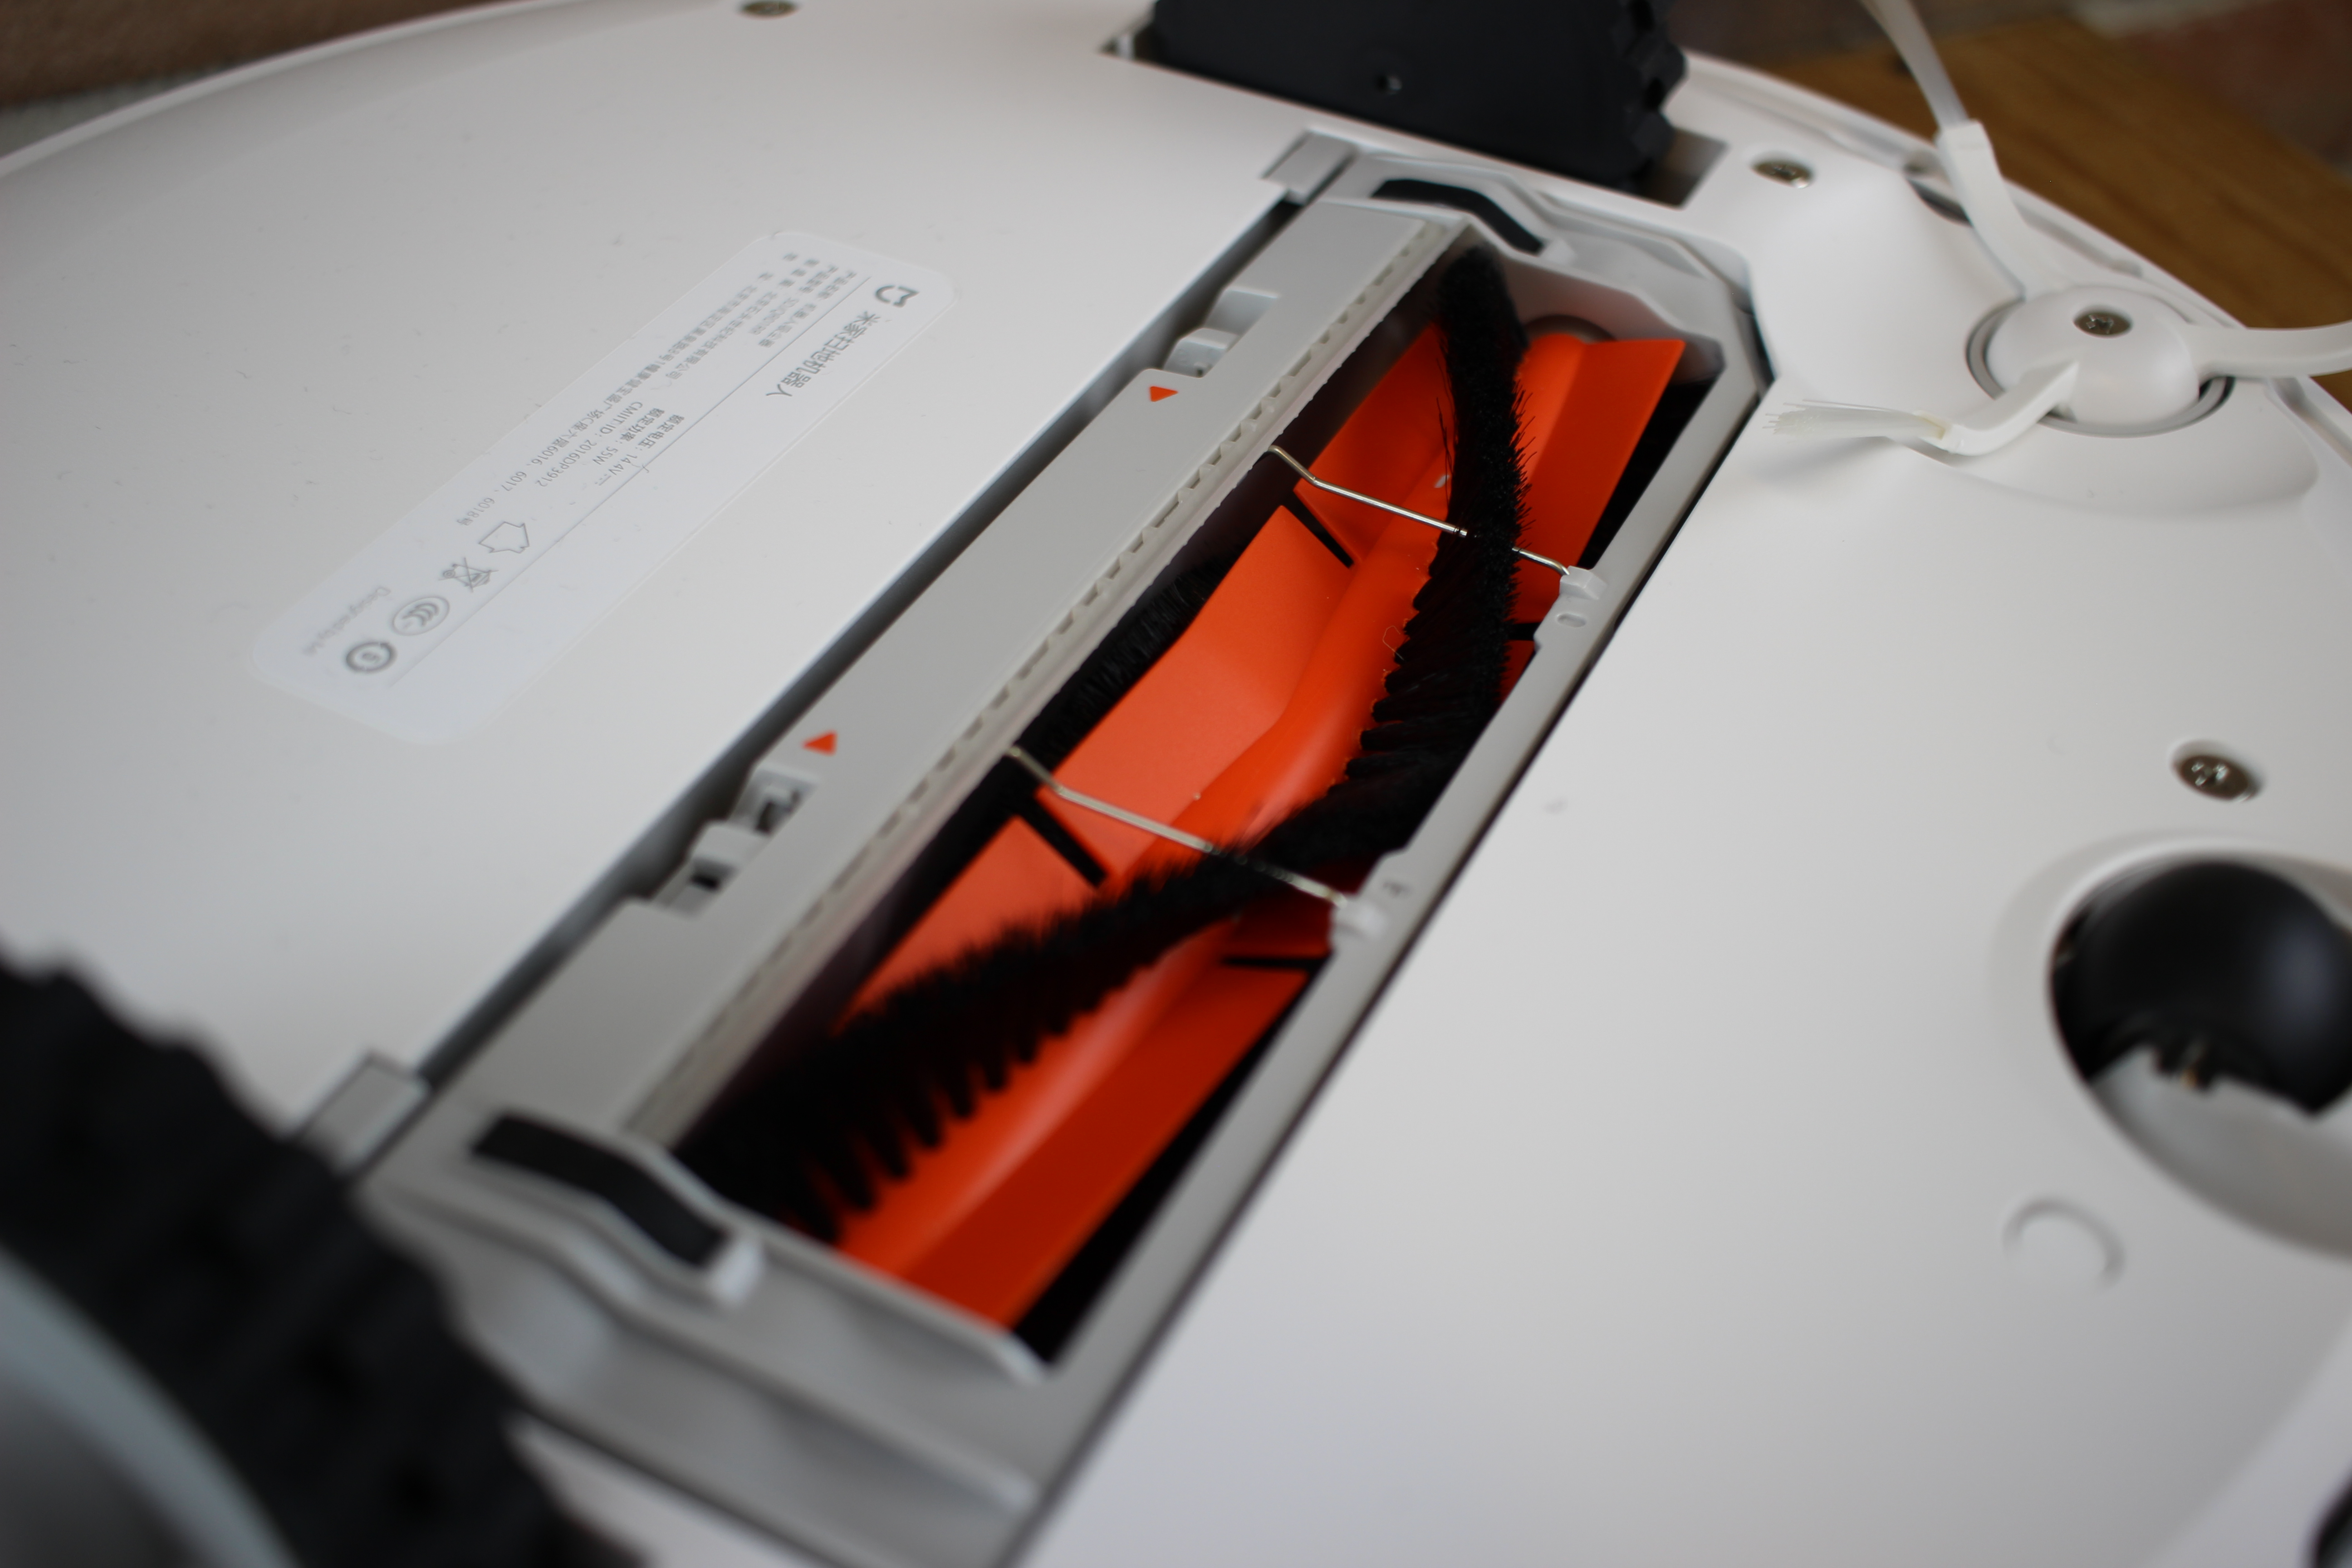 Fußboden Kaufen Xiaomi ~ Elektrischer wischmopp xiaomi electric mop d im test